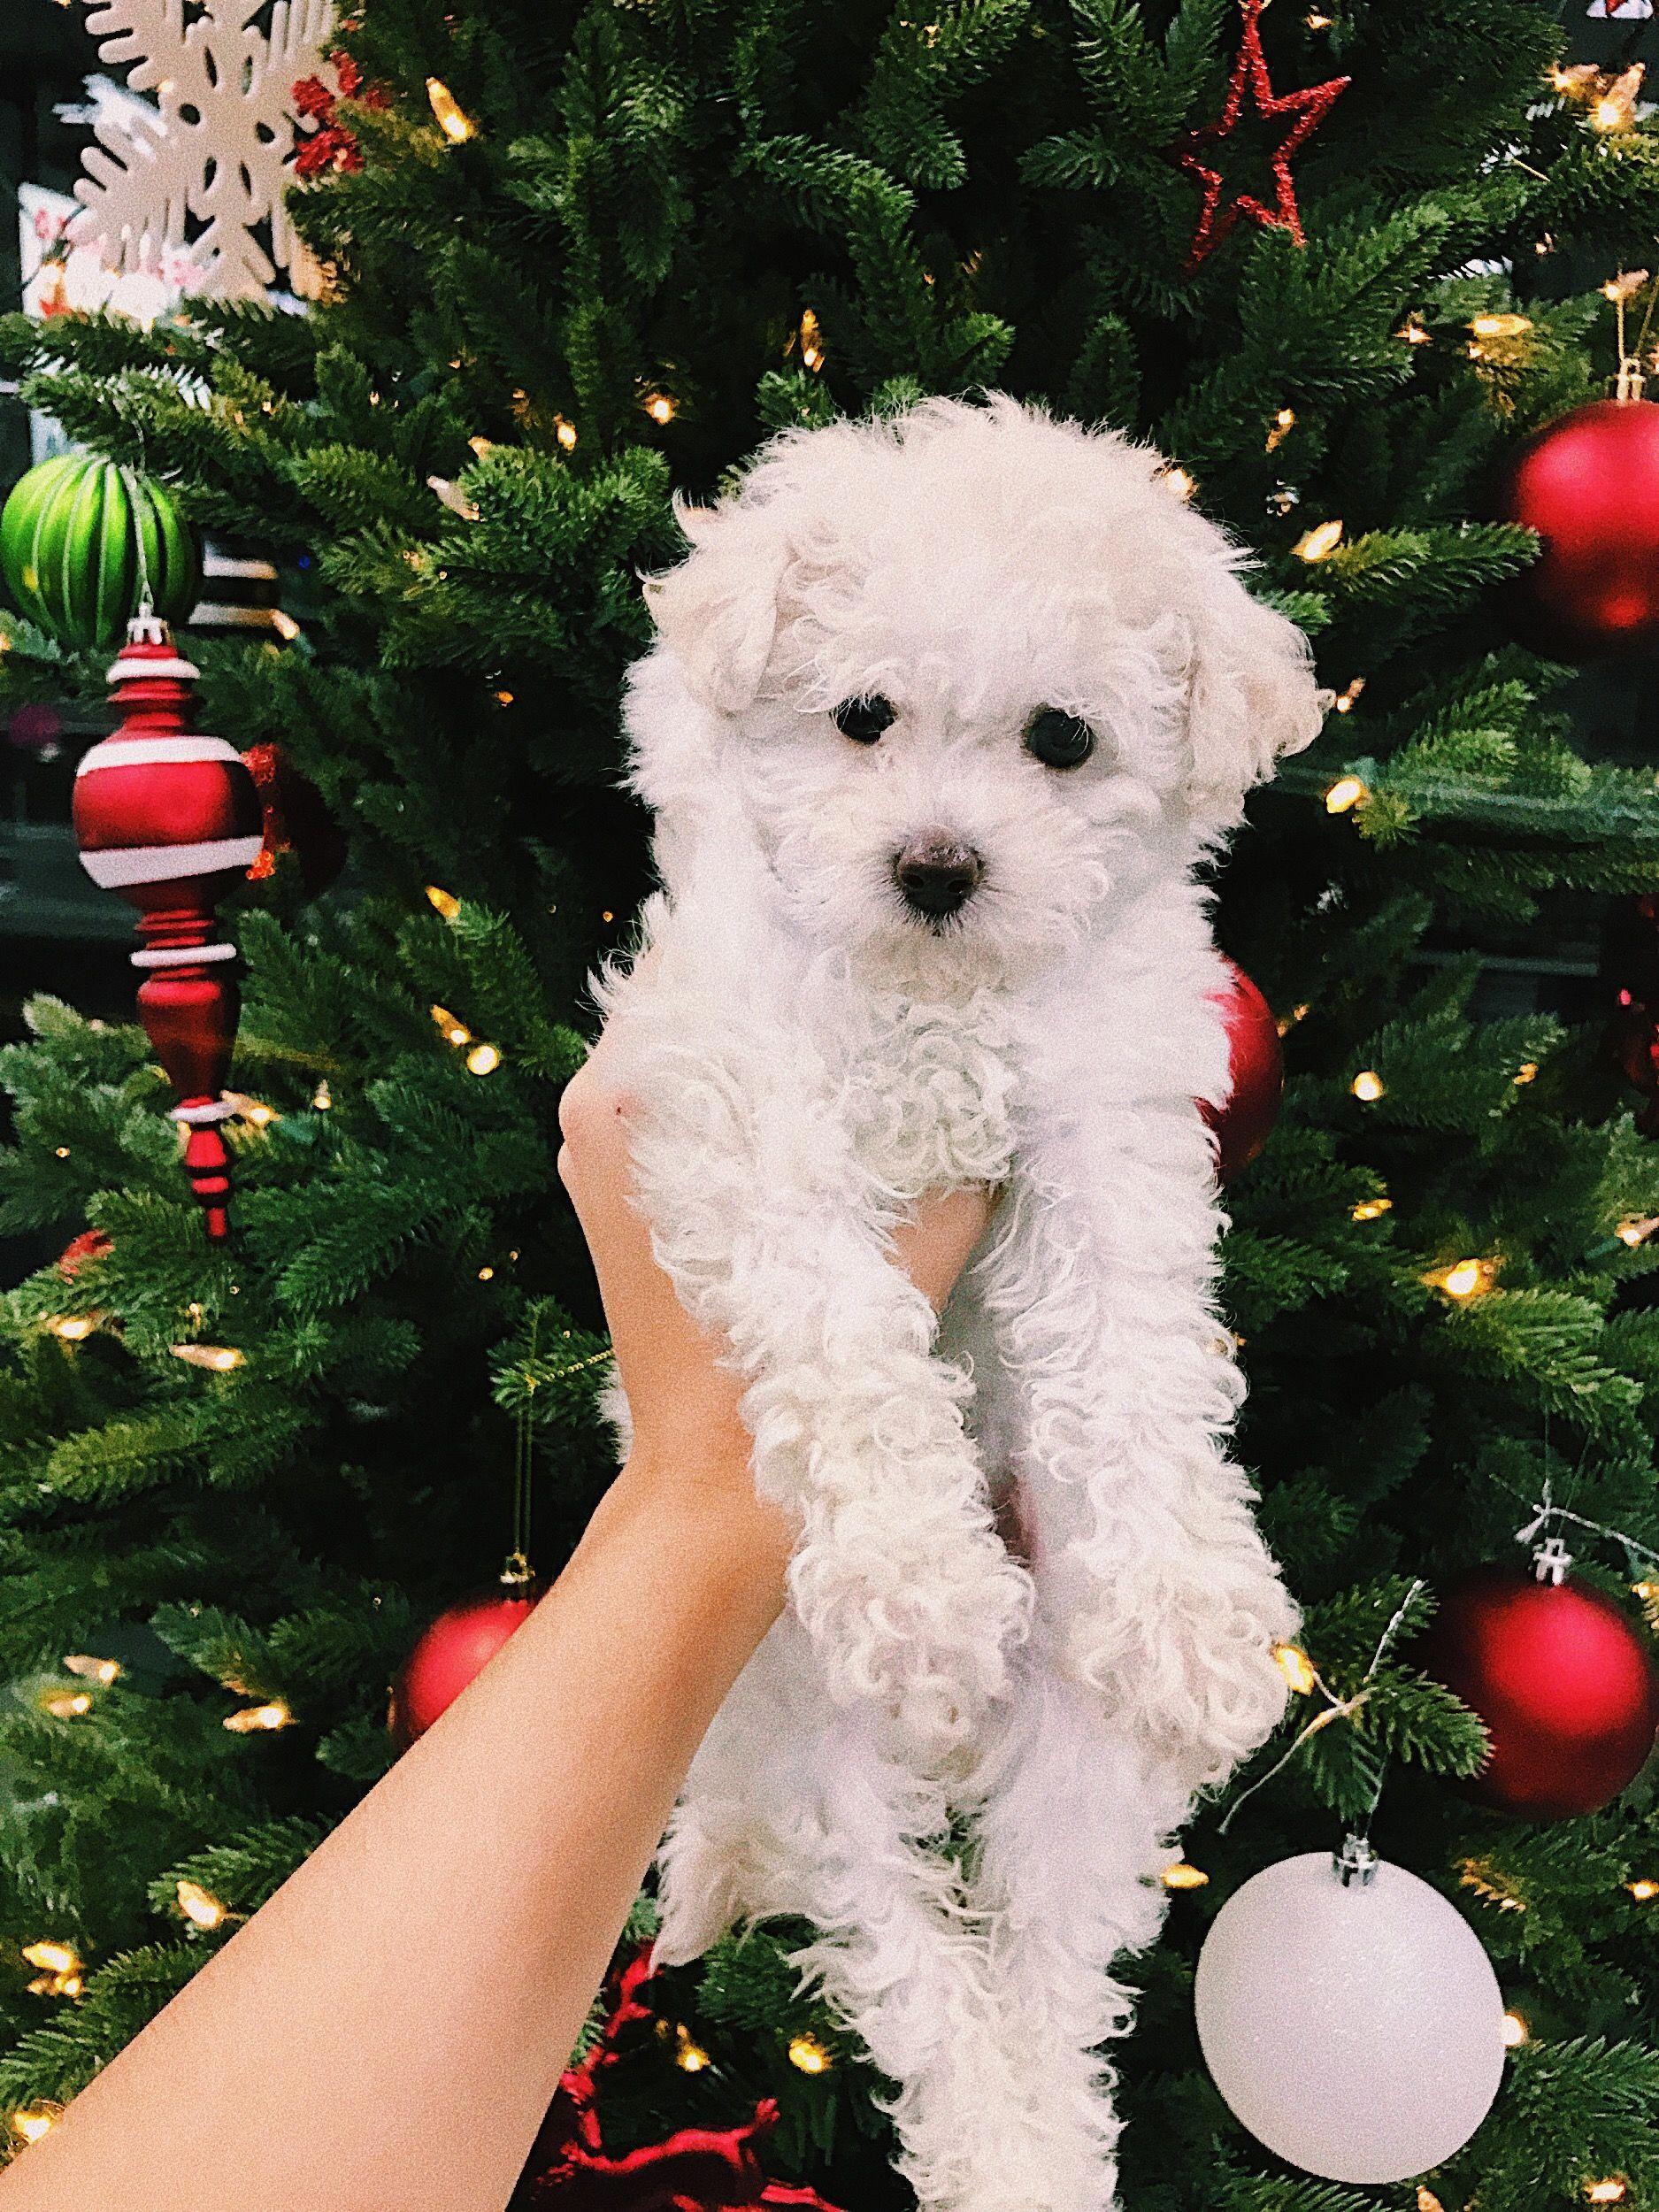 Little poodle teacupfrenchbulldog white toy poodle